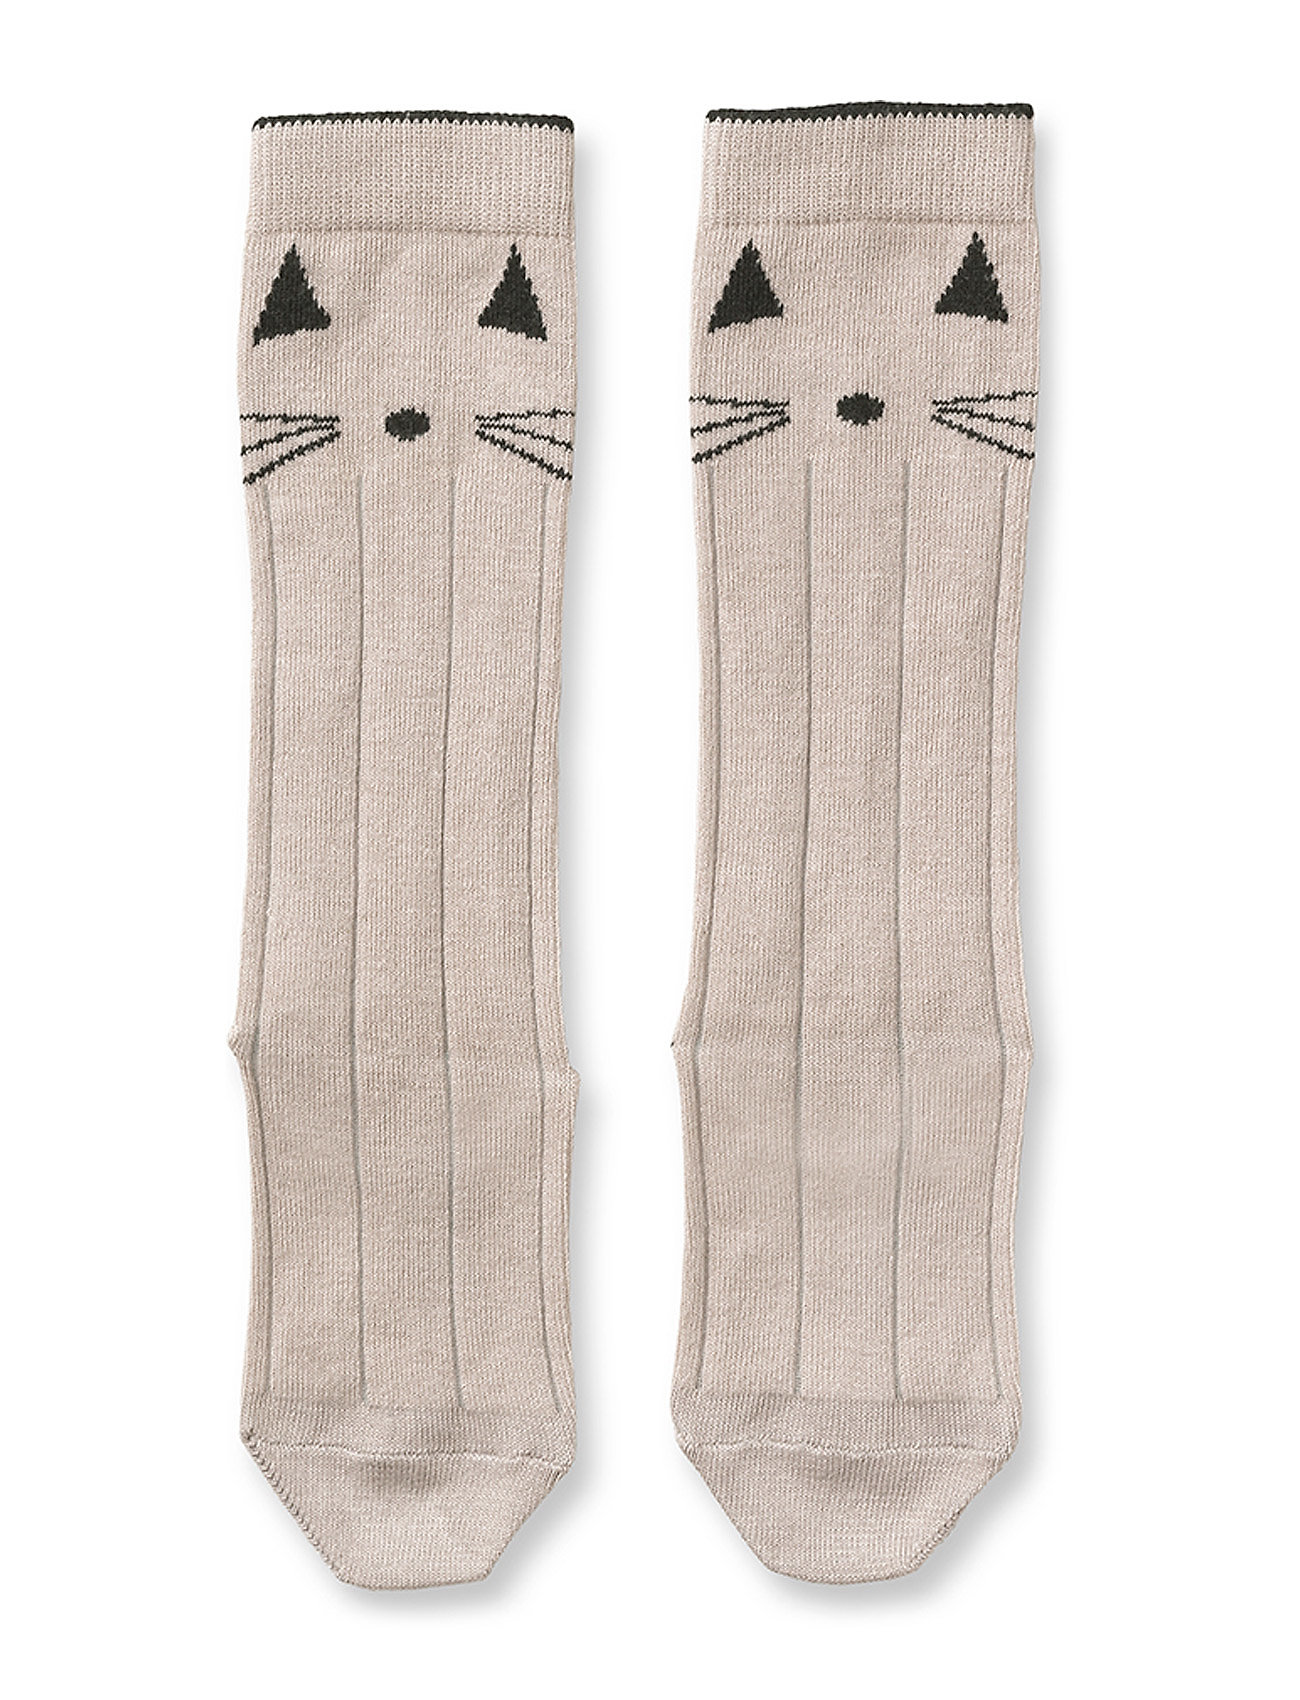 Liewood Sofia cotton knee socks